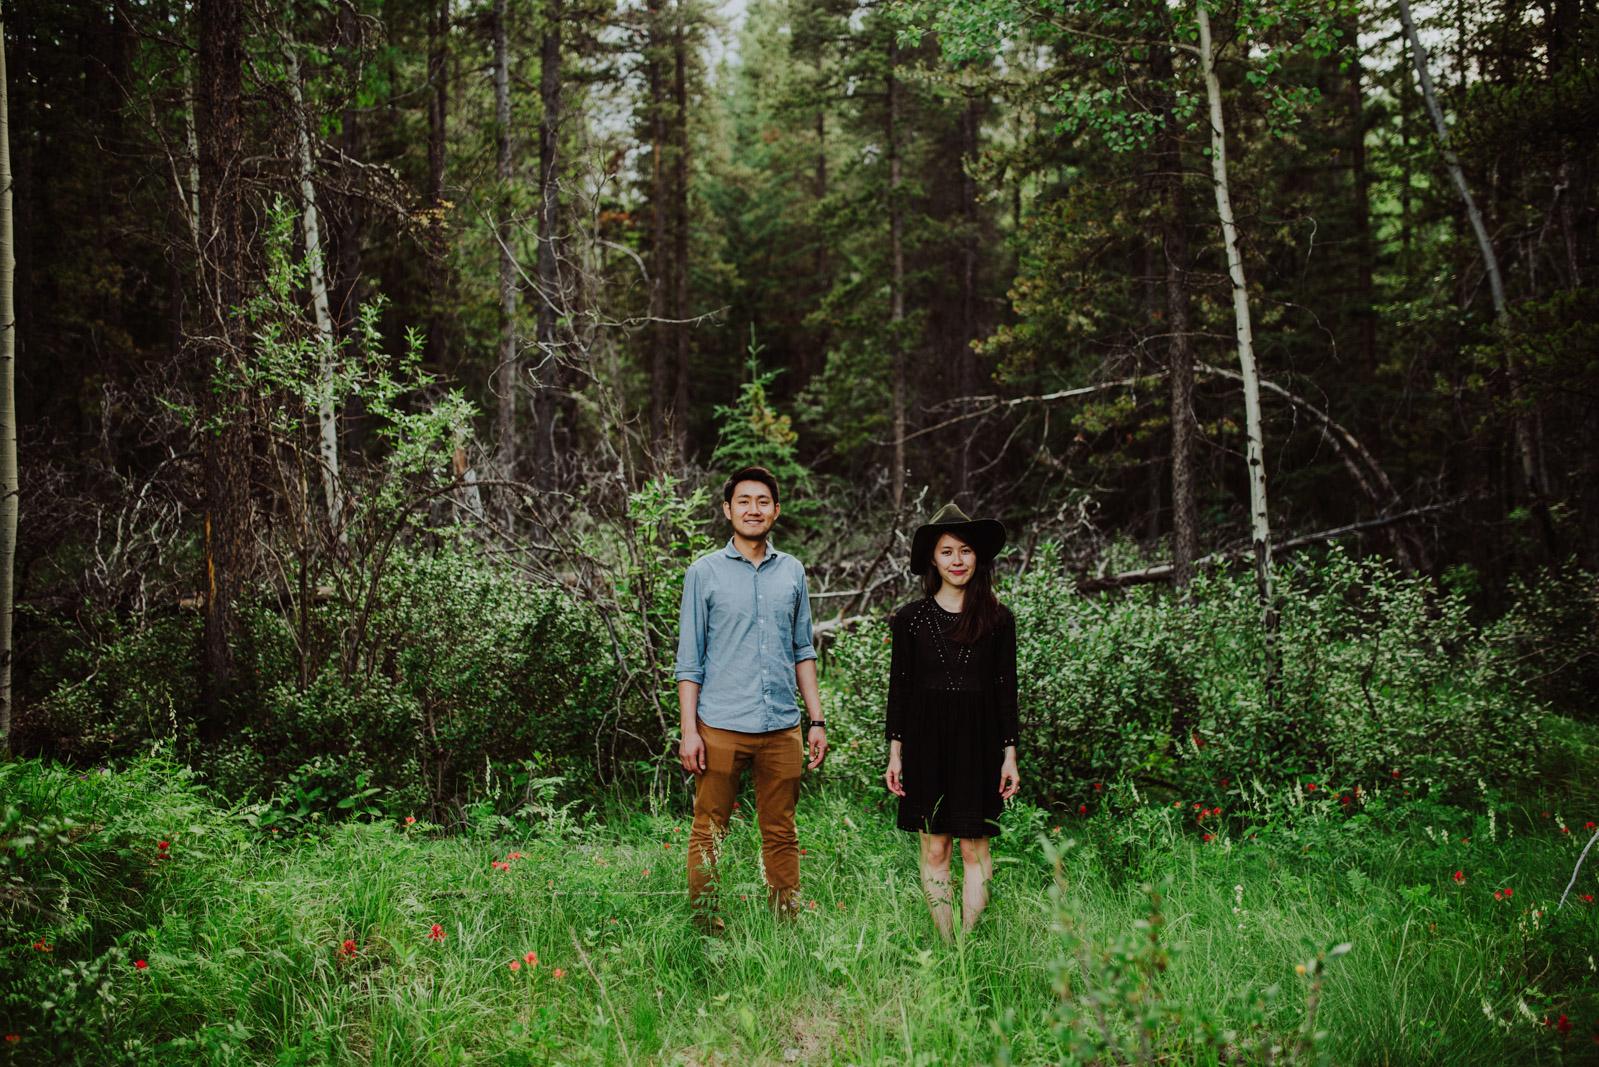 Banff-Wedding-Photographer-michaelchan-14.jpg